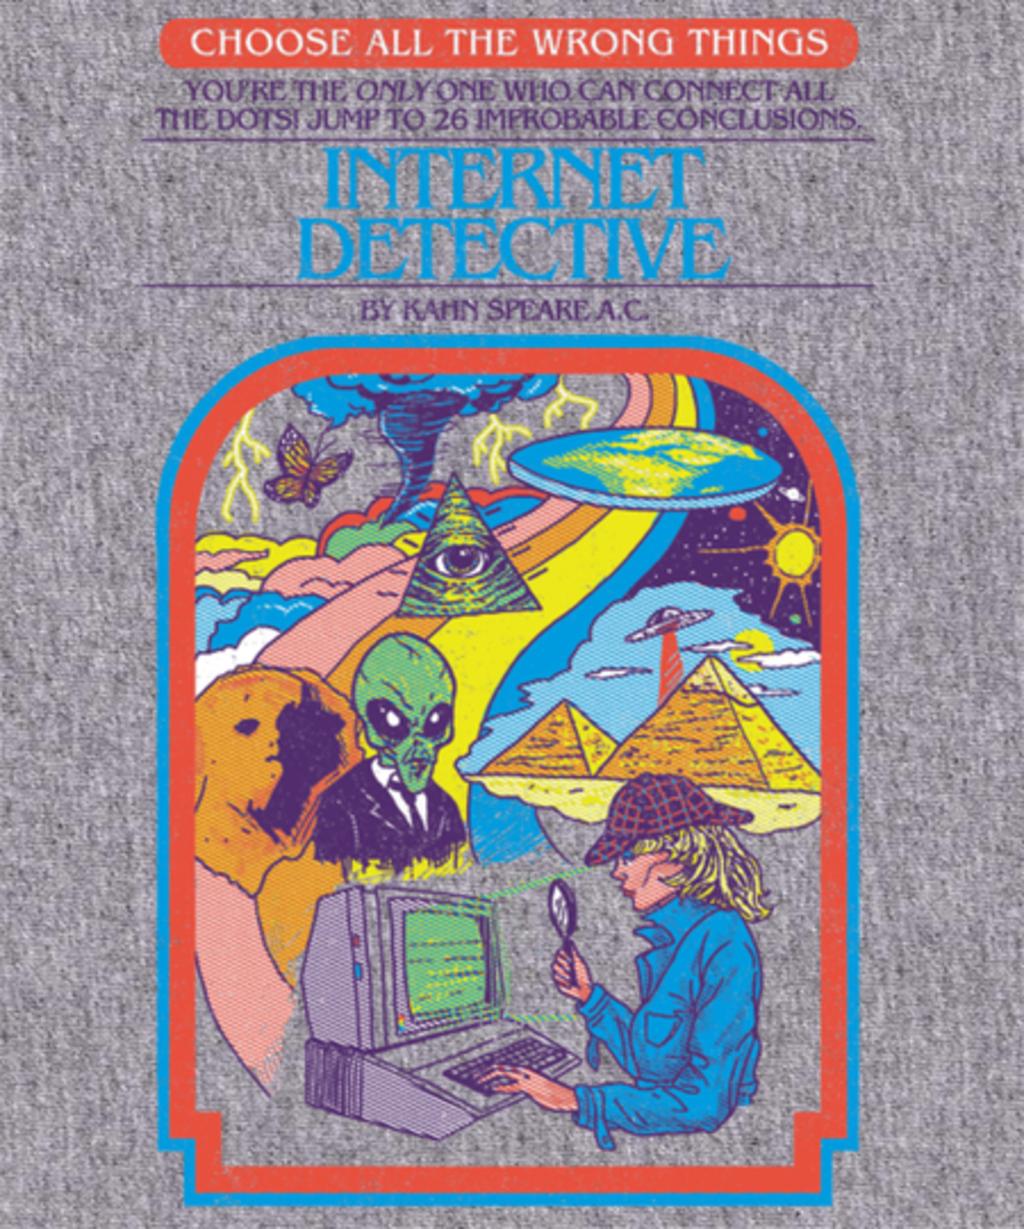 Qwertee: Internet Detective